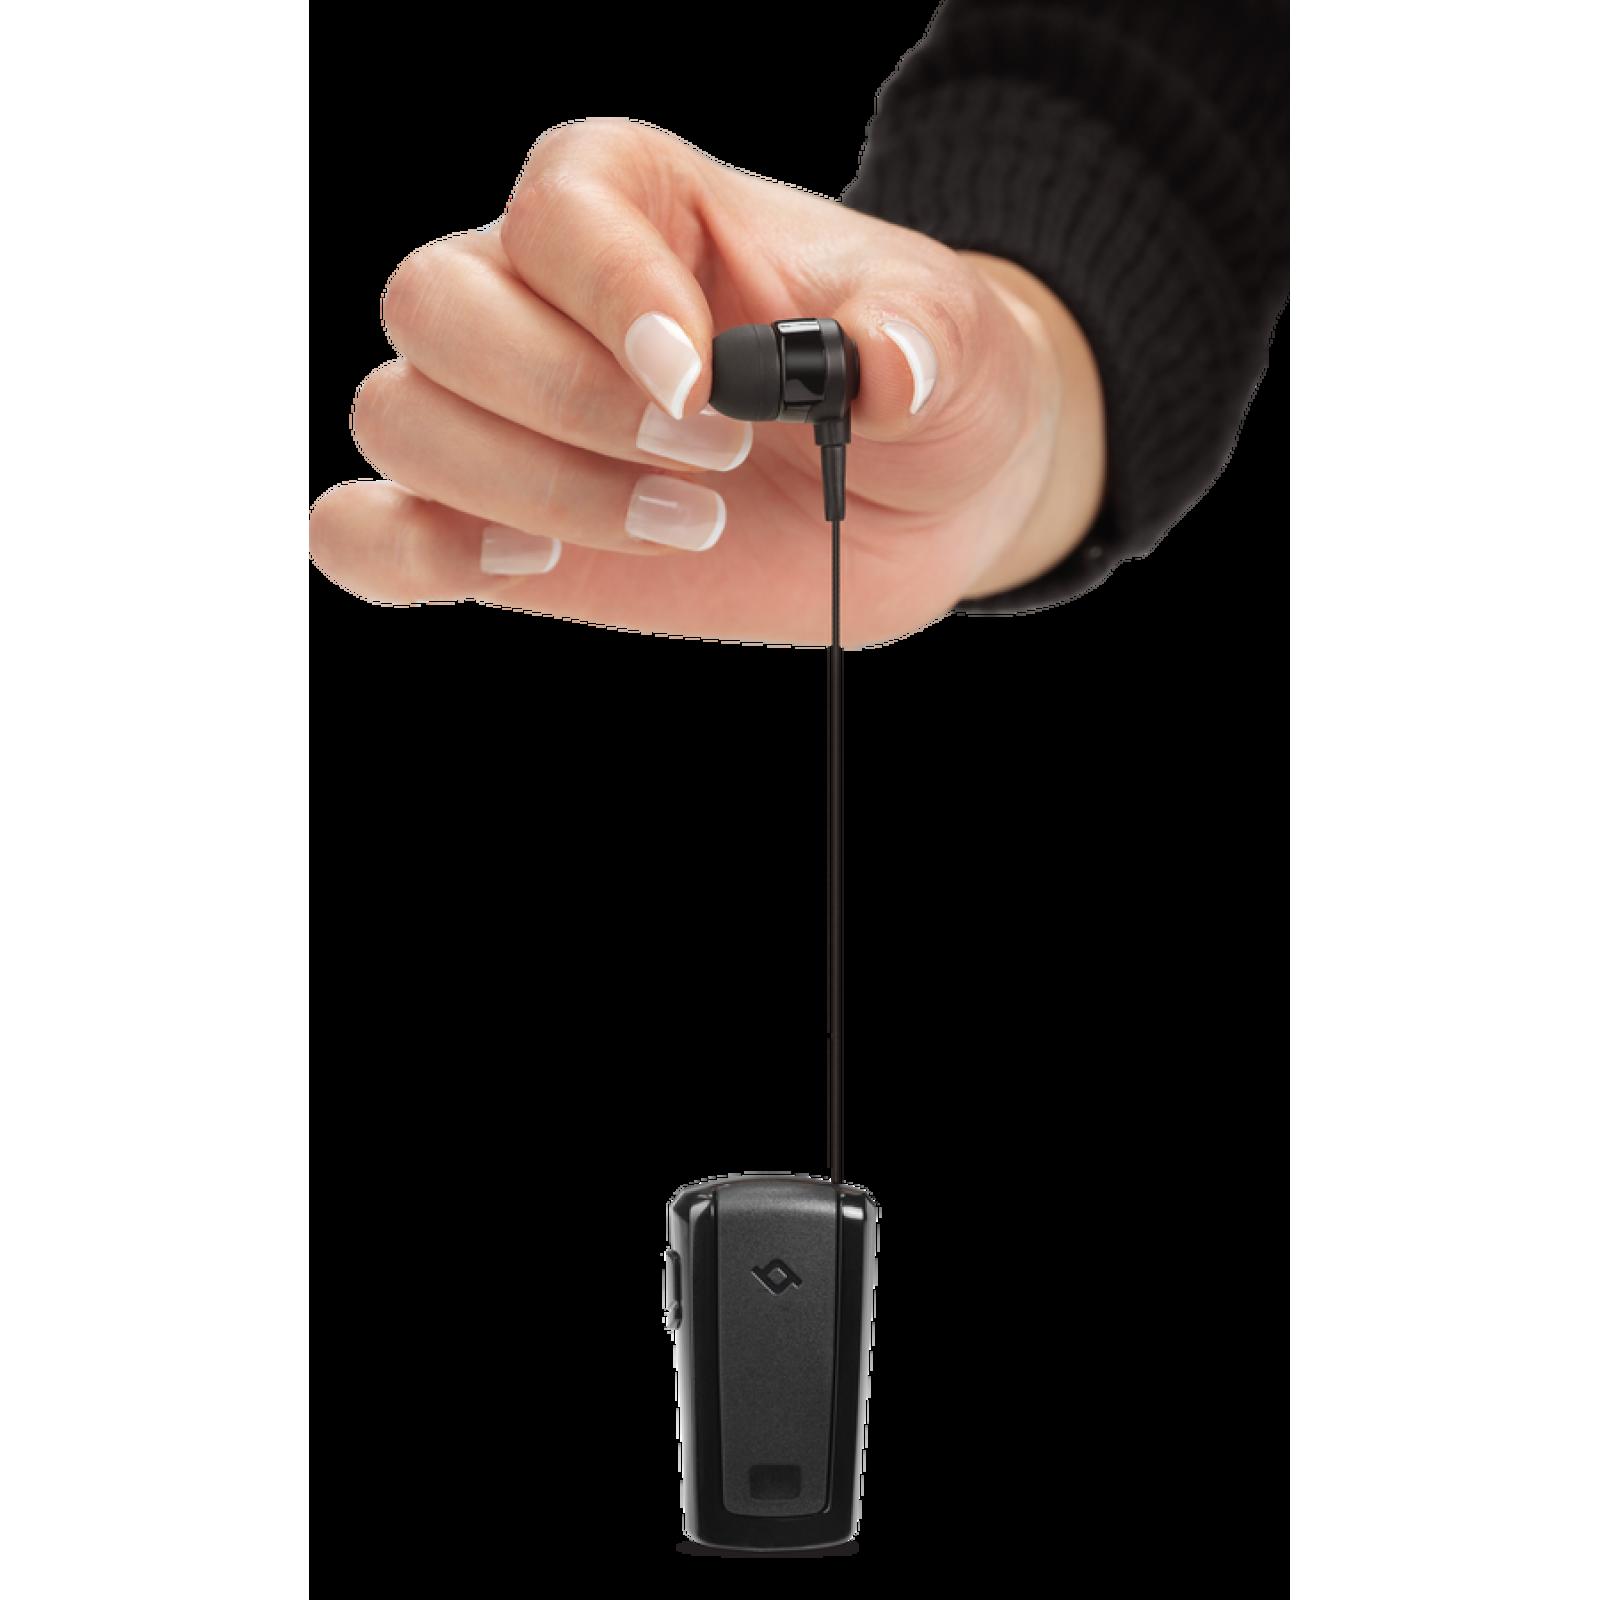 Bluetooth слушалка Macaron Mini Bluetooth Headset with Retractable Earphone